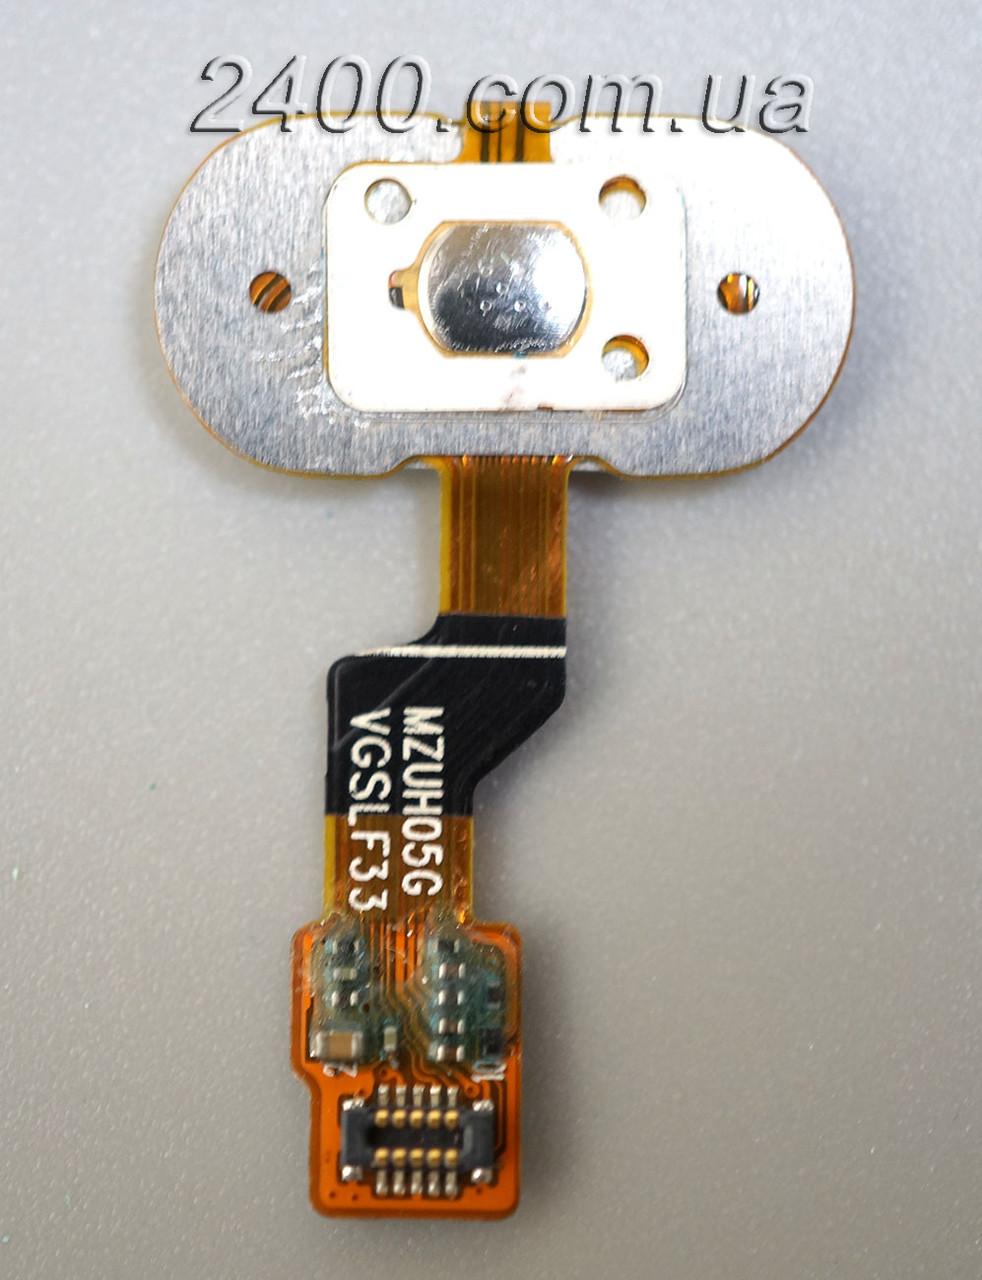 Home button Meizu M3S (кнопка для Meizu M3S) – шлейф кнопки meizu m 3s + сенсорная кнопка Мейзу М3С золотая